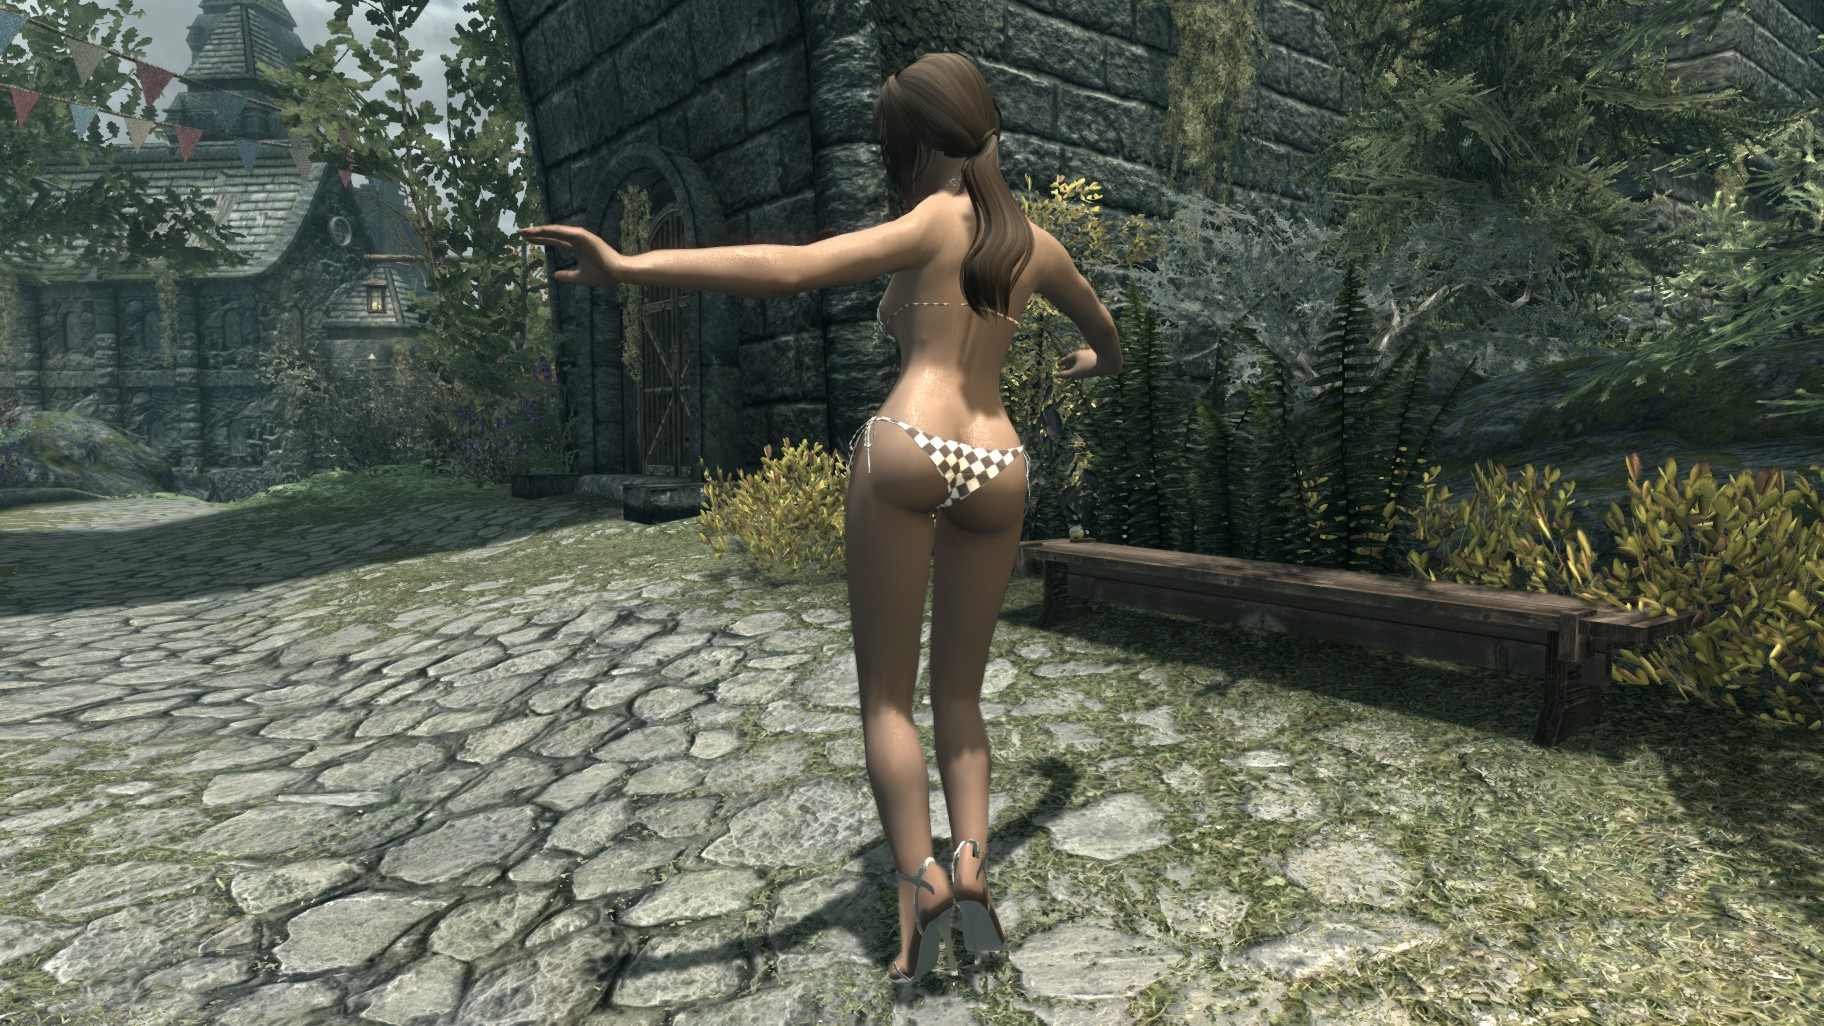 Видео секс мода хорошая